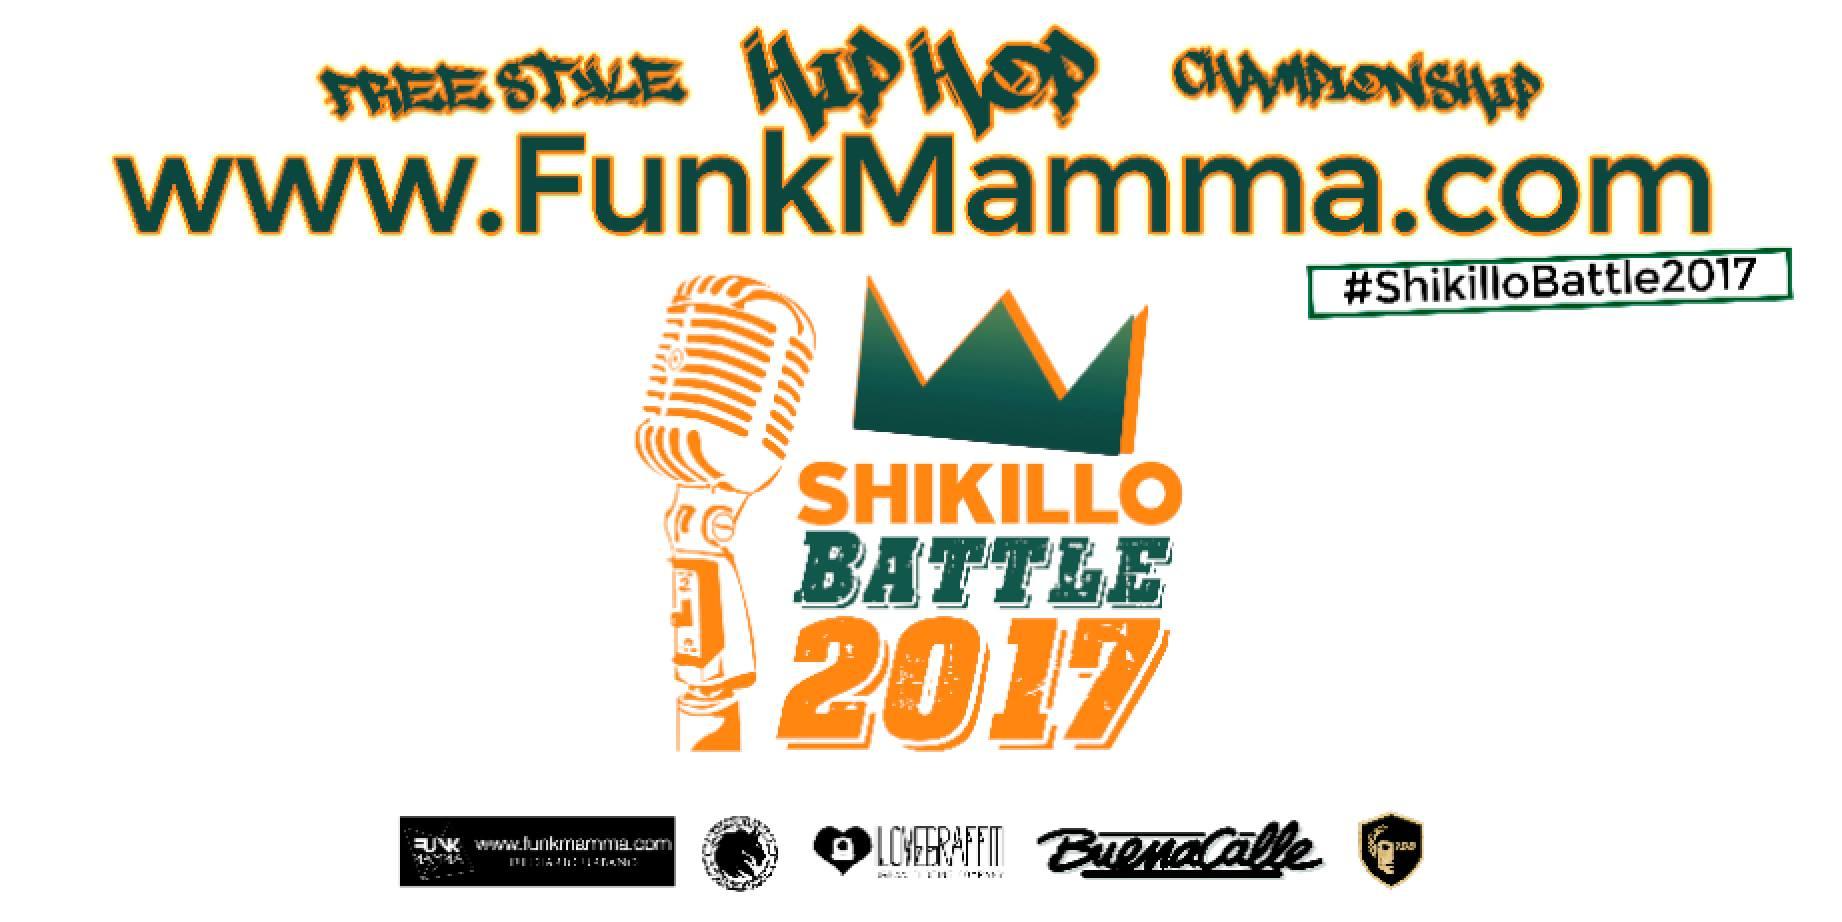 Shikillo Festival 2017 - Candeleda - Shikillo Battle - TiétarTeVe